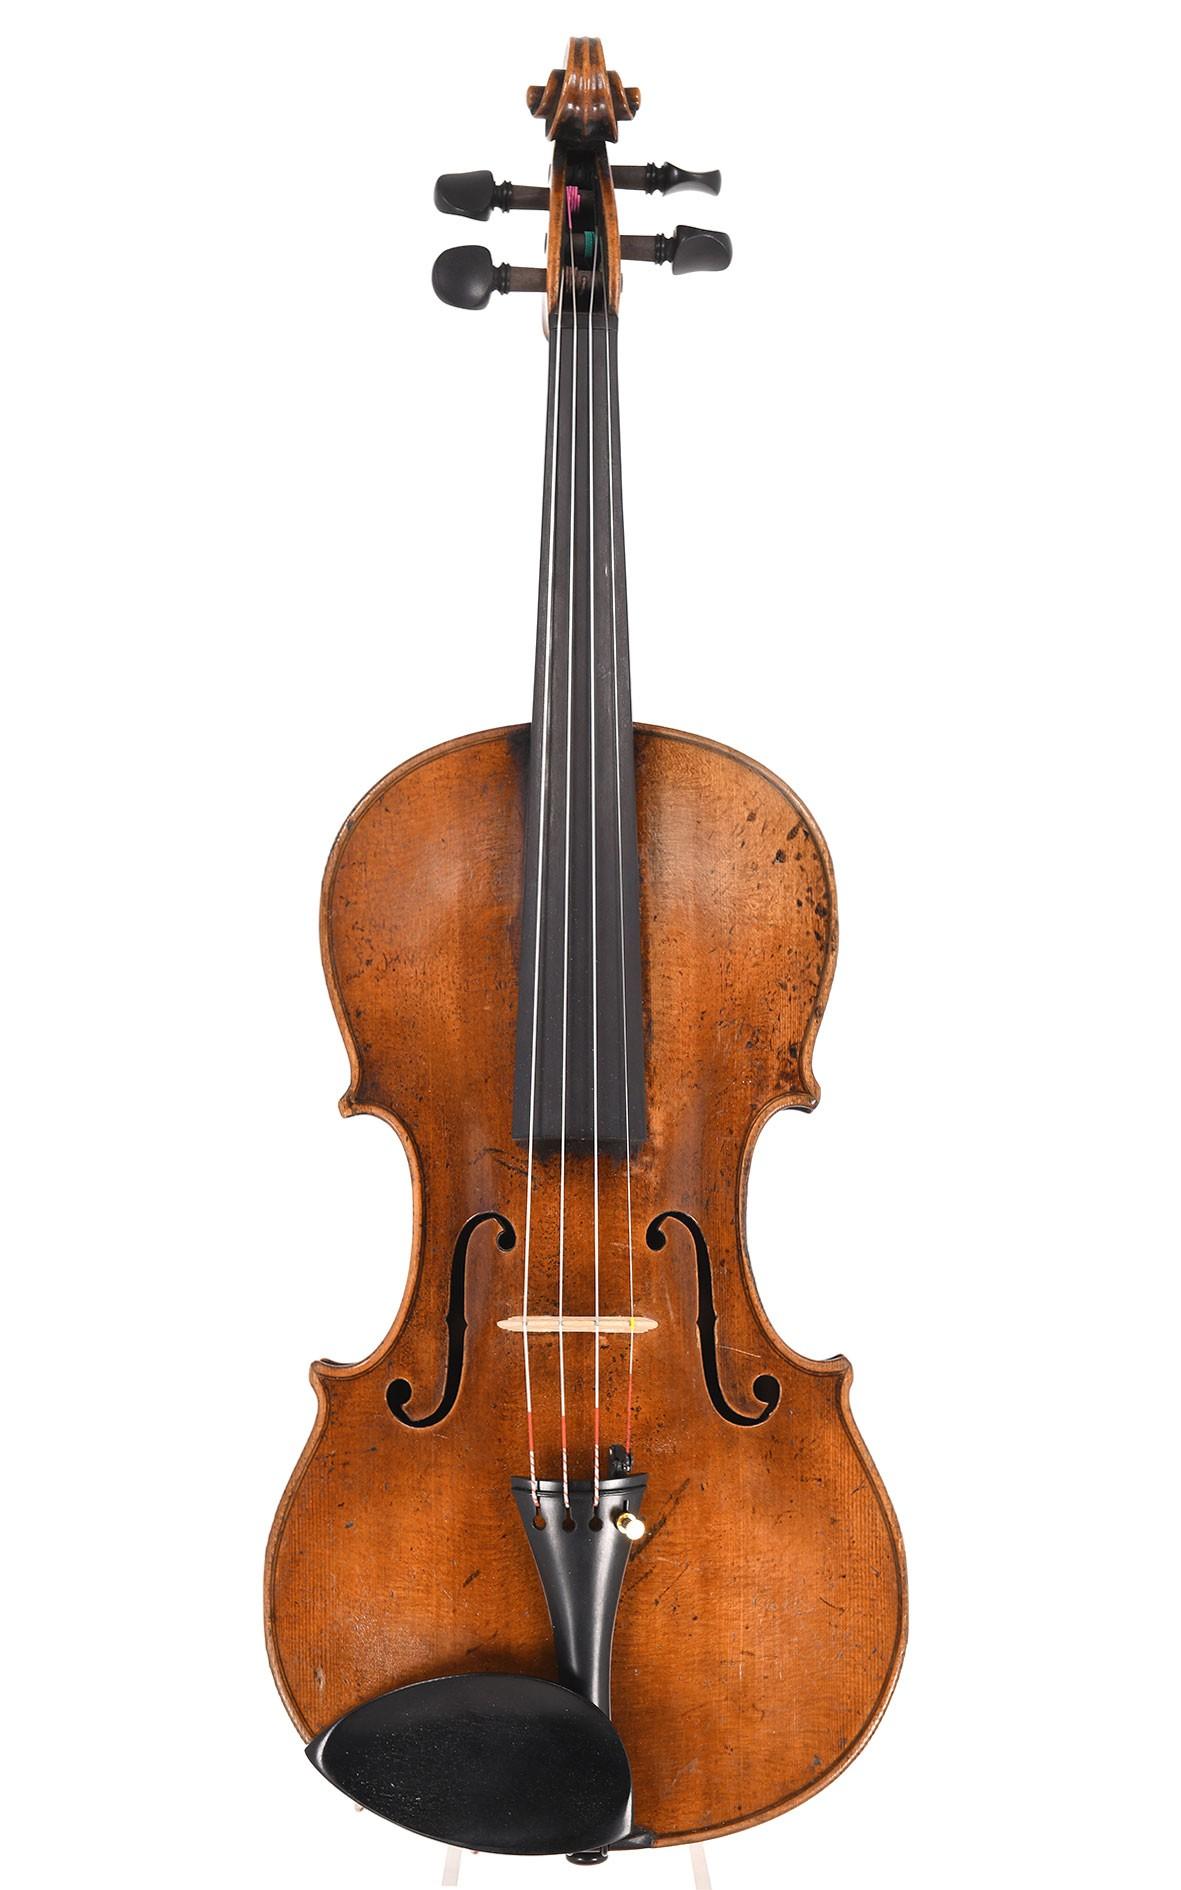 German violin after Stainer